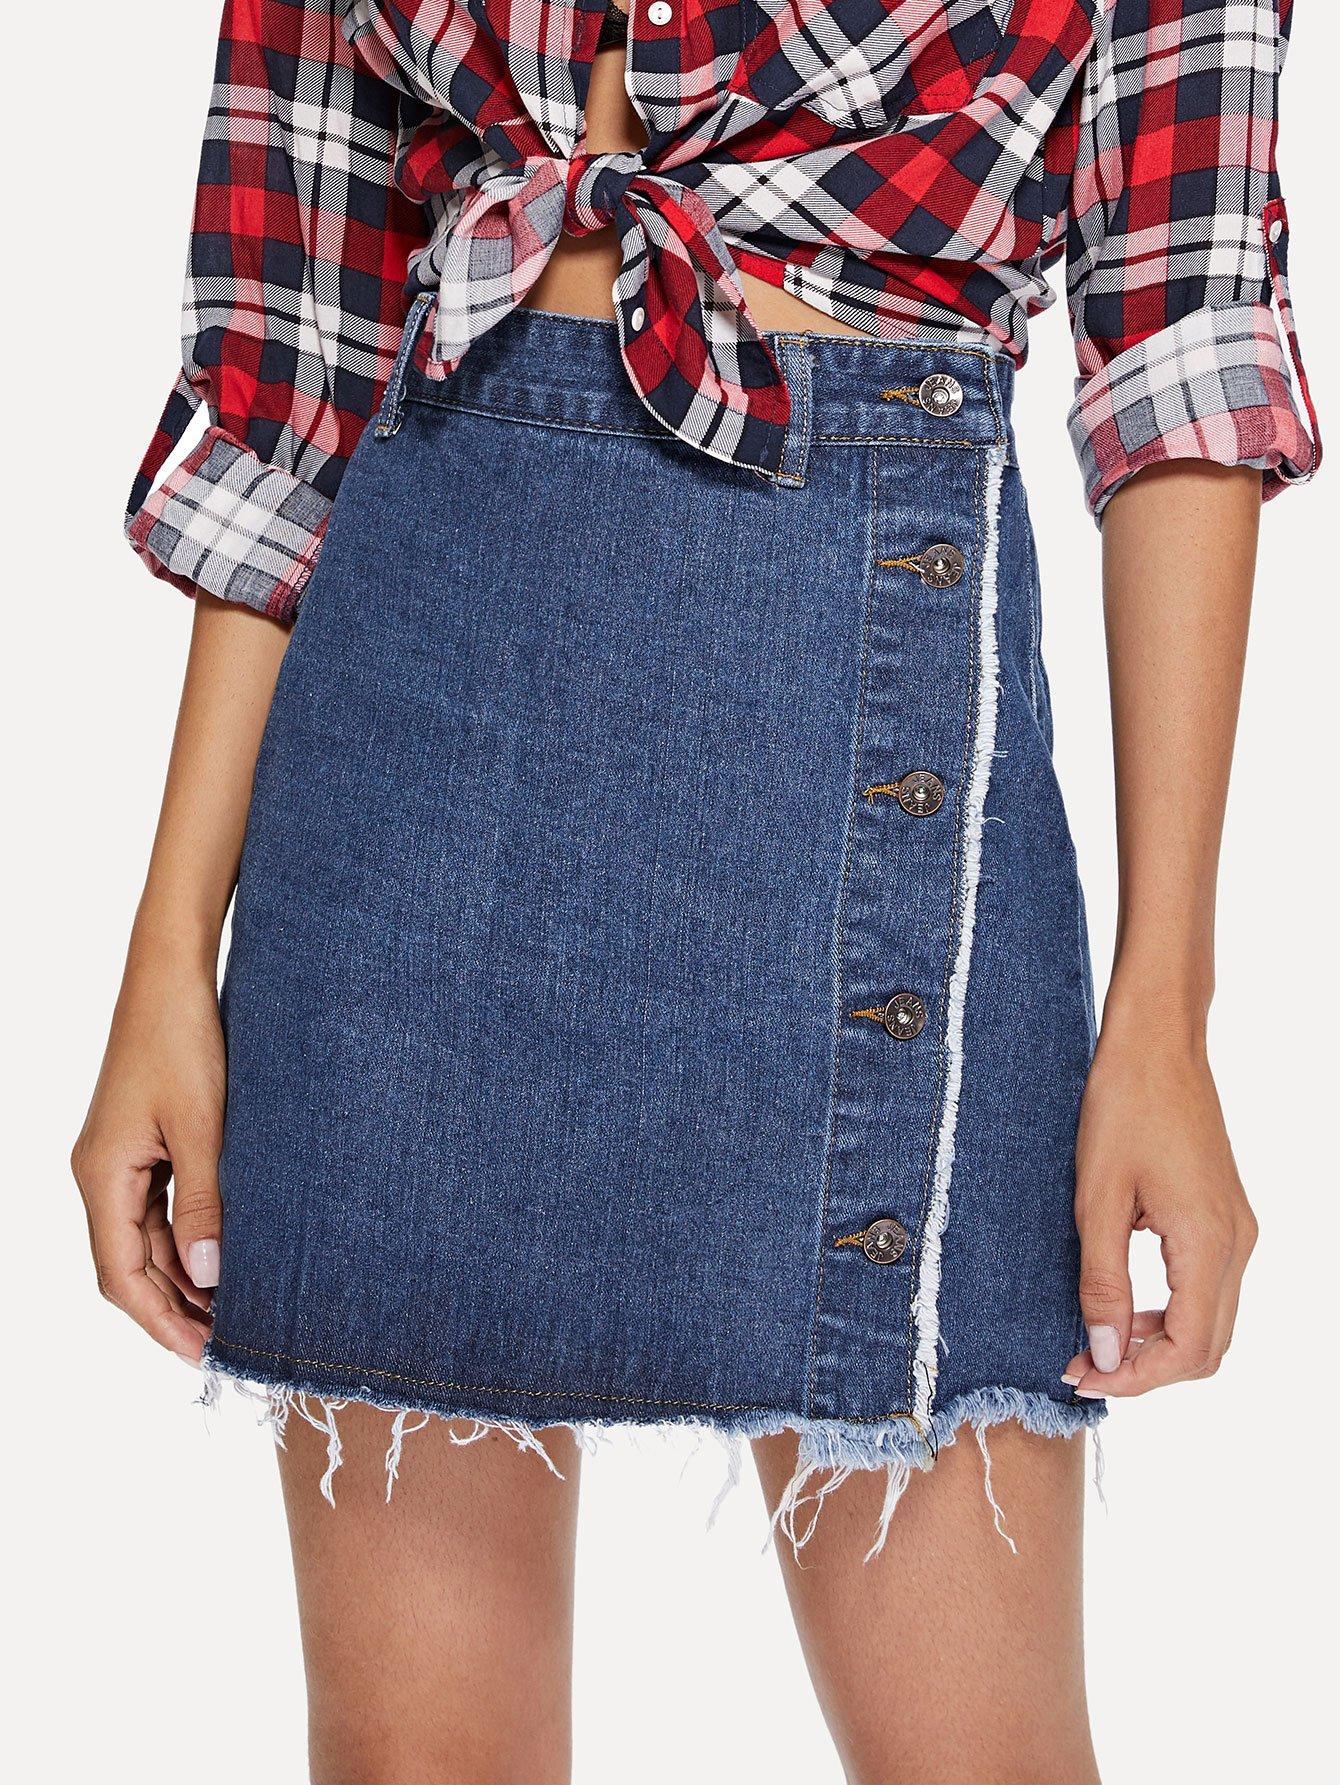 Buttoned Side Raw Hem Skirt girls single breasted raw hem skirt